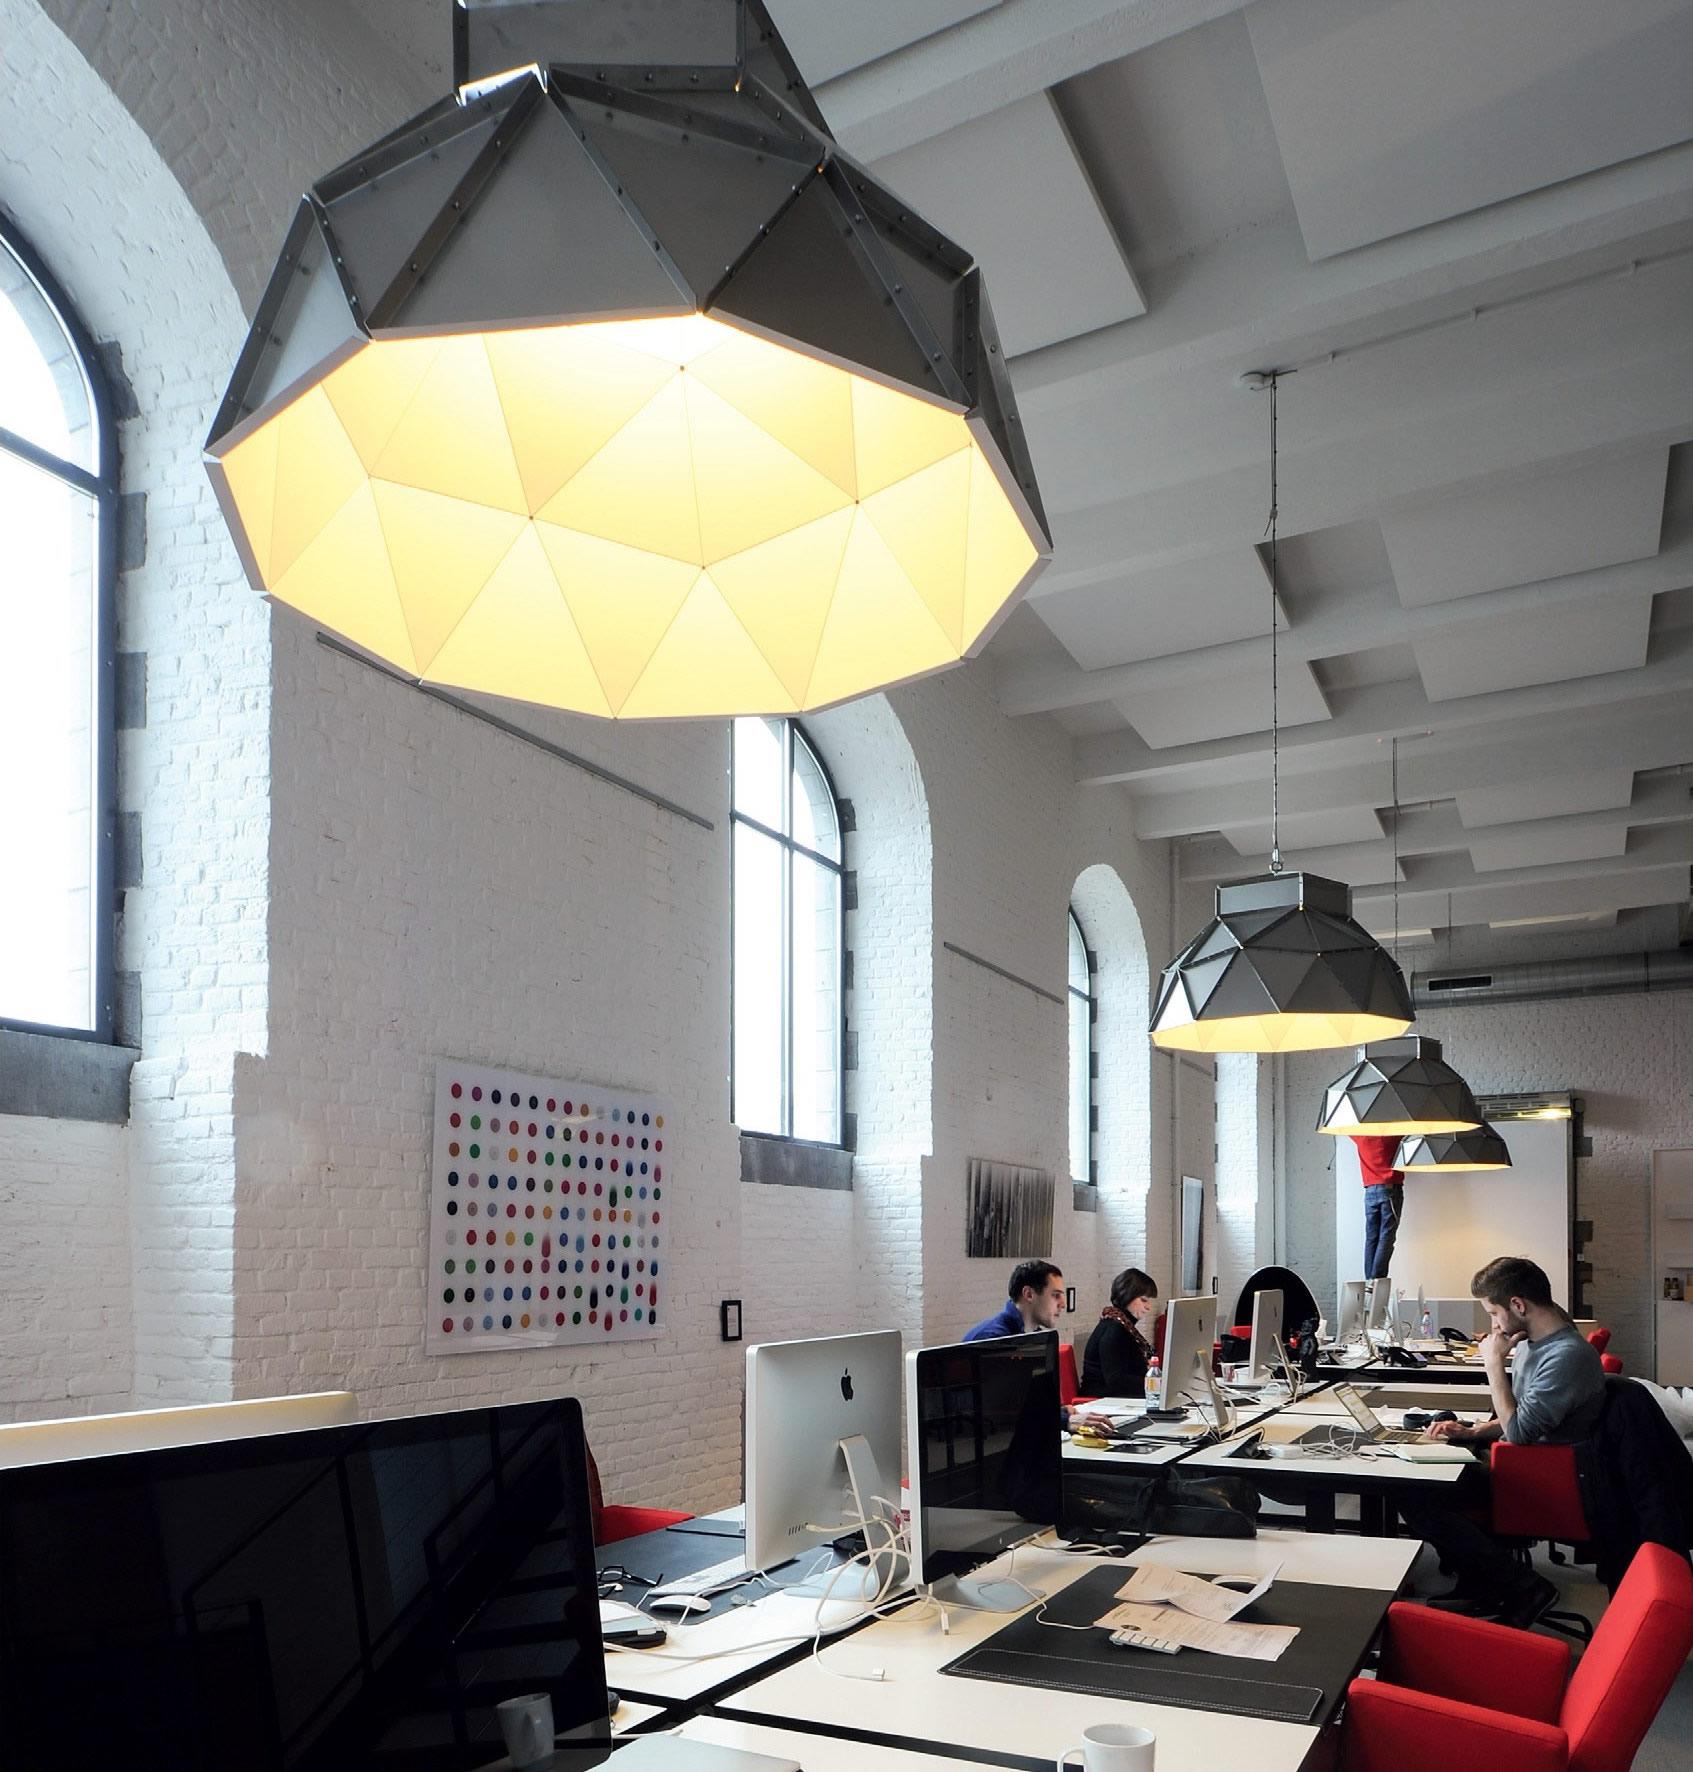 Apollo Pendant Lamp by Romy Kühne for DARK AT NIGHT